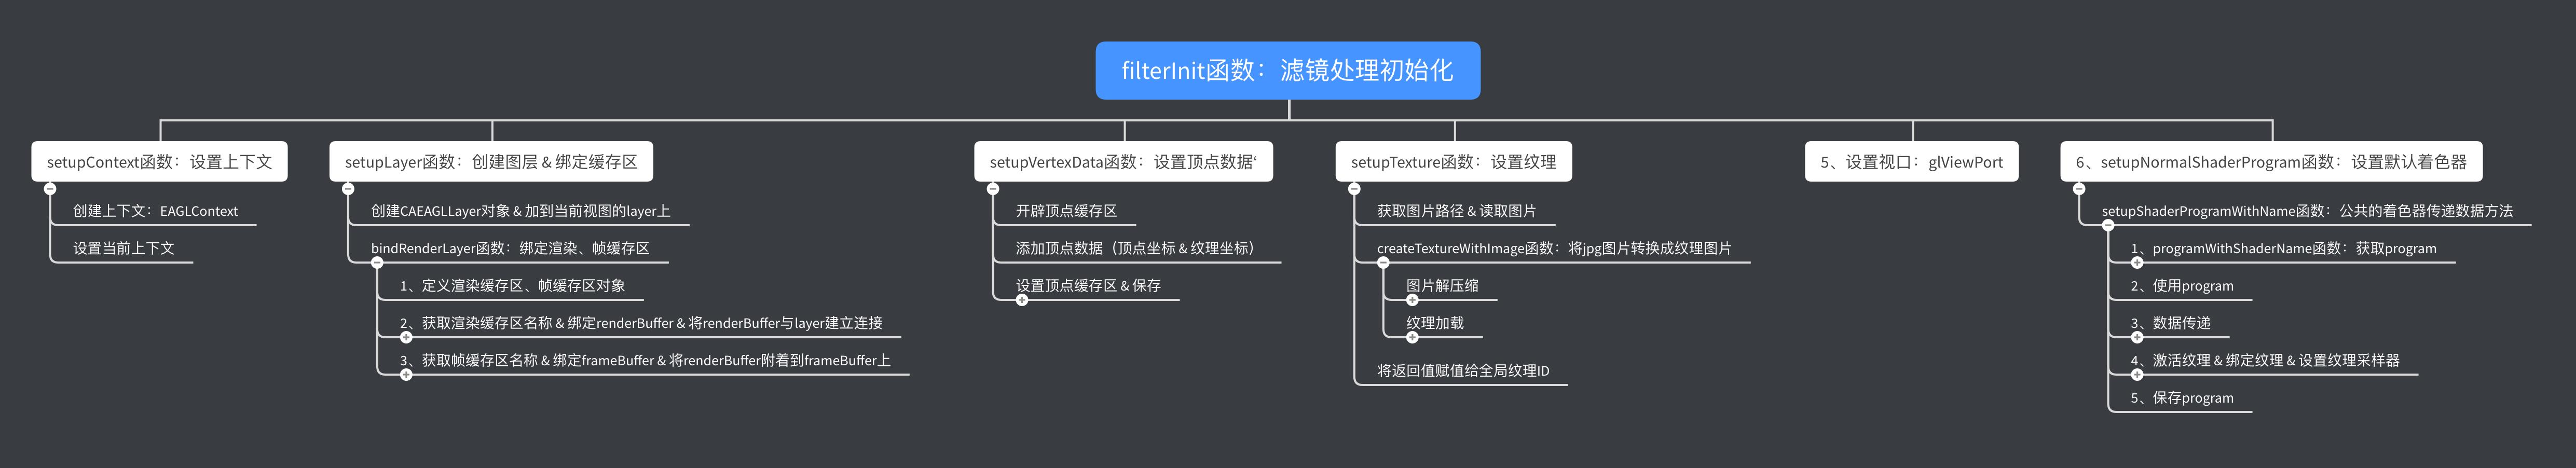 filterInit函数流程